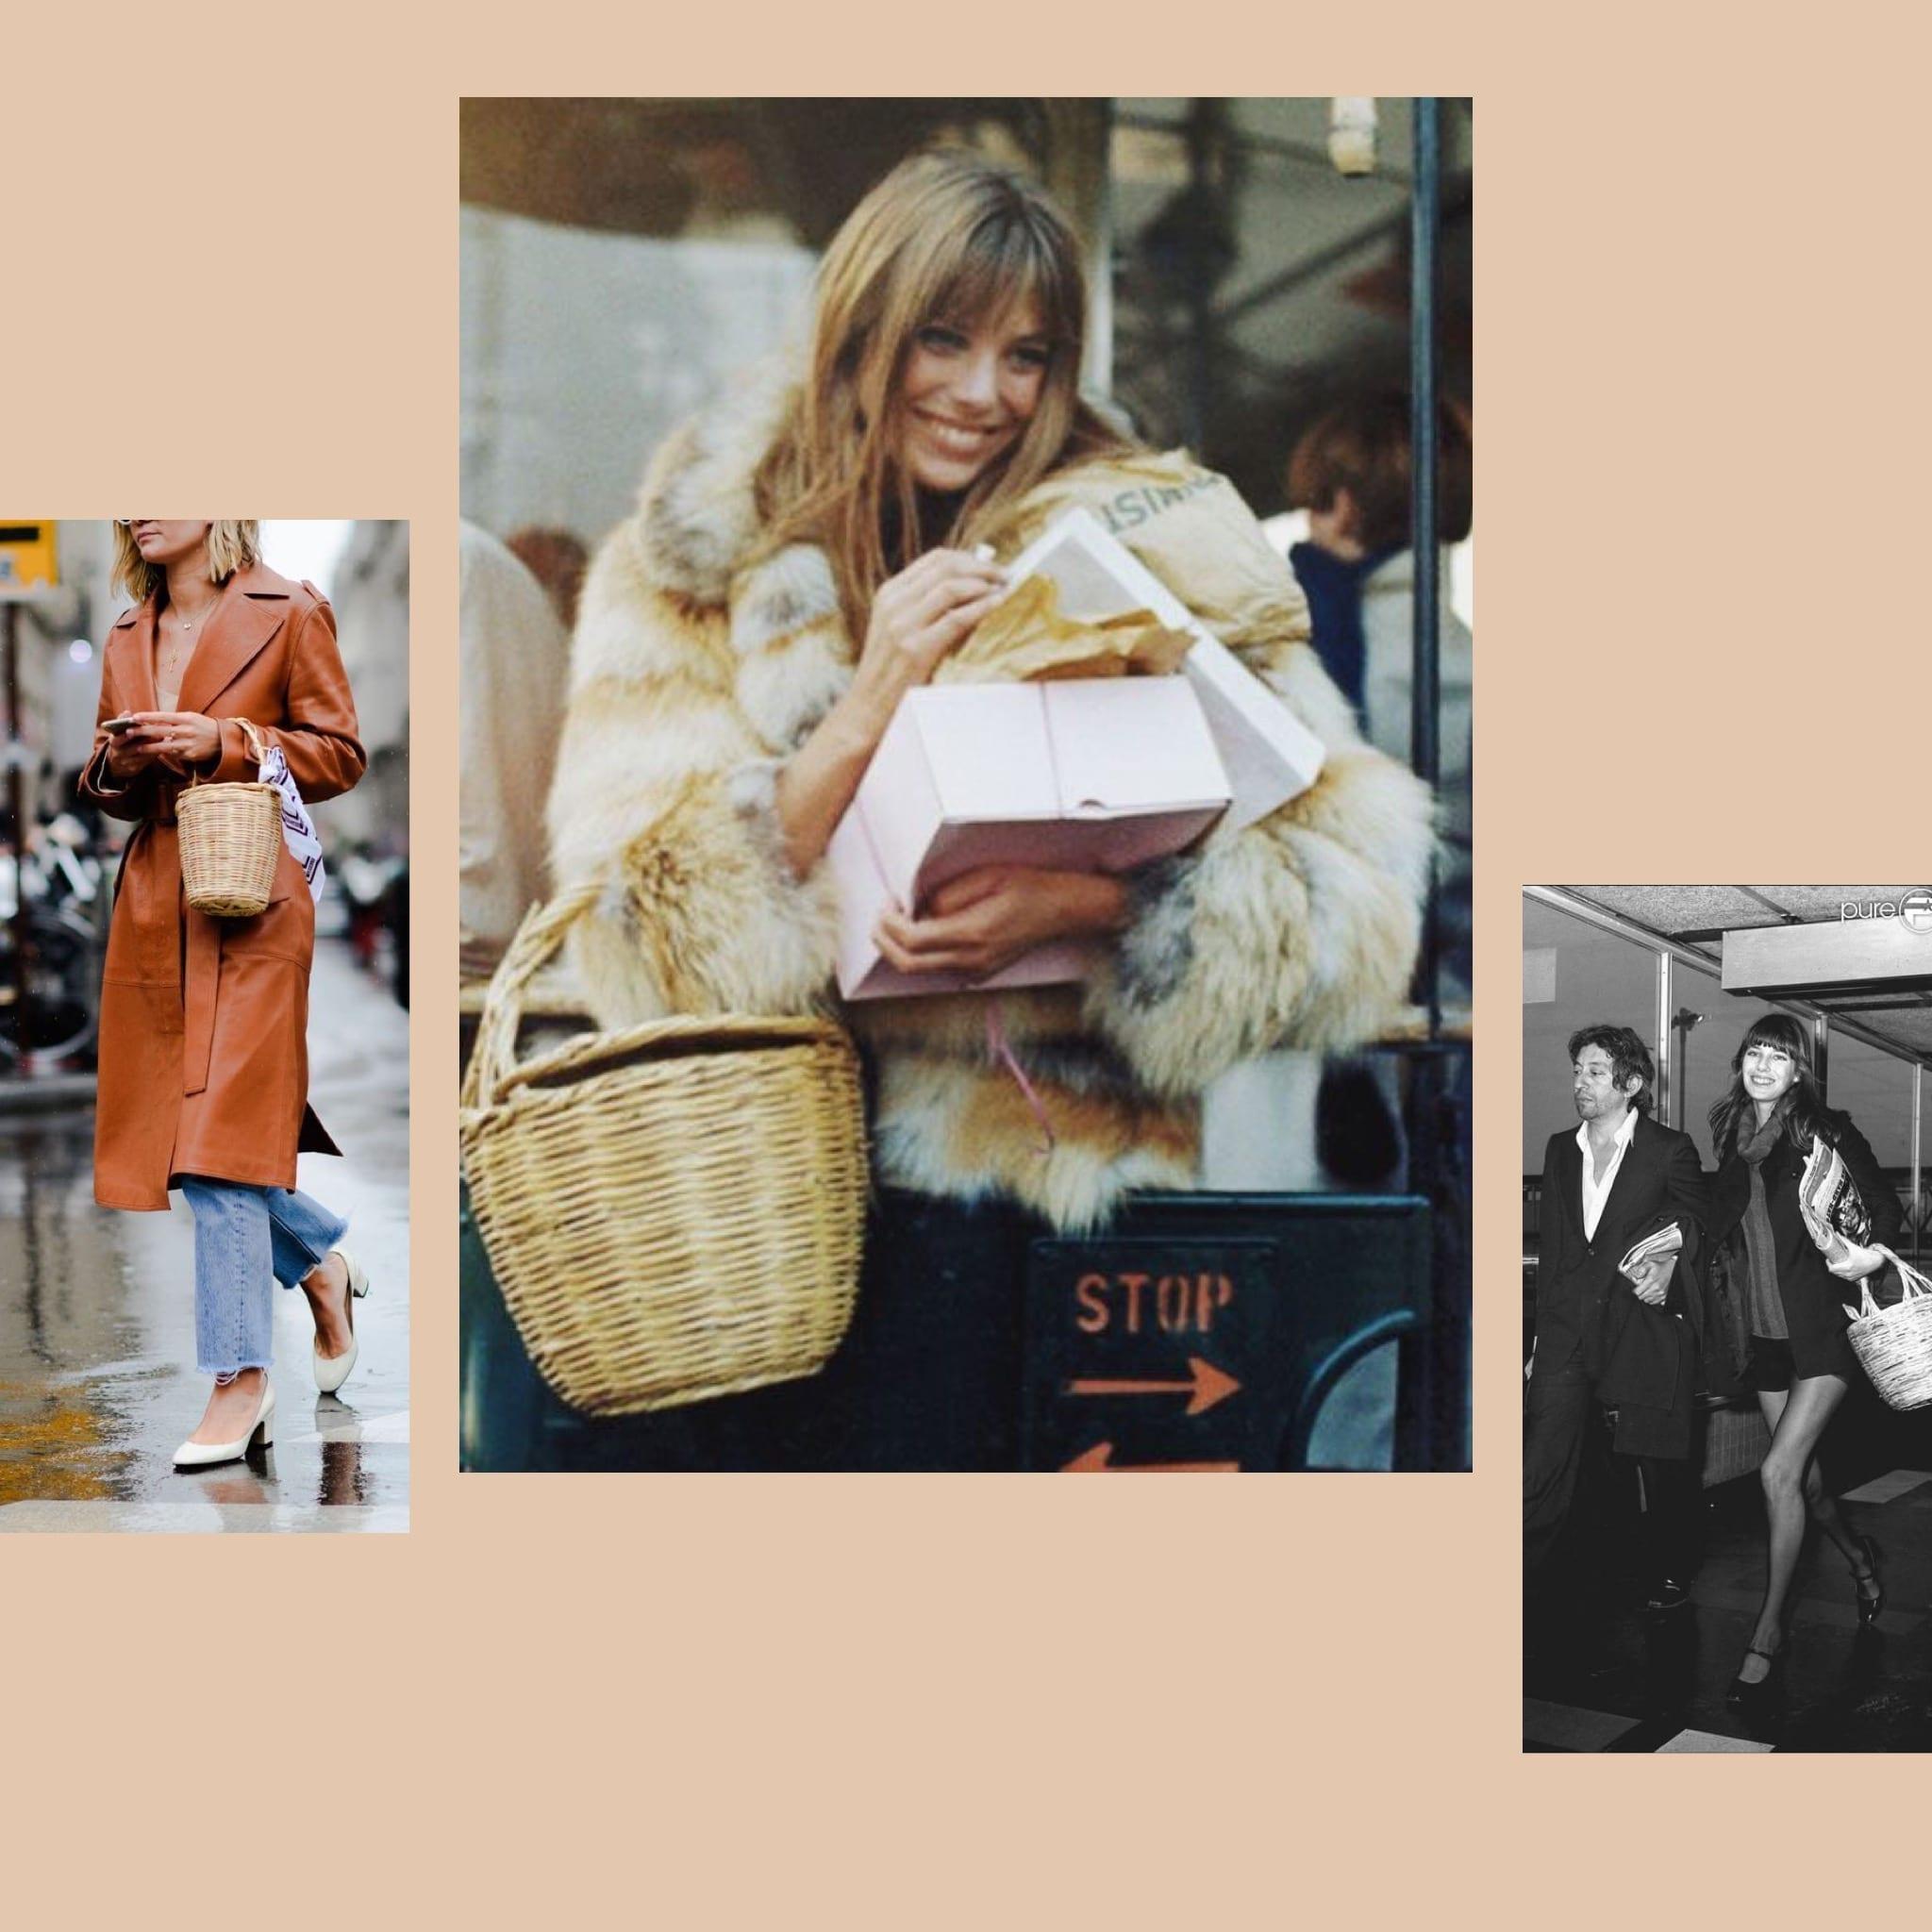 Cesta Jane Birkin, cesta vimini jane birkin, cesta vimini zara, cestino pic-nic zara, blogger italiane 2018, fashion blogger italiane 2018, elisa bellino, dove comprare cesta jane birkin